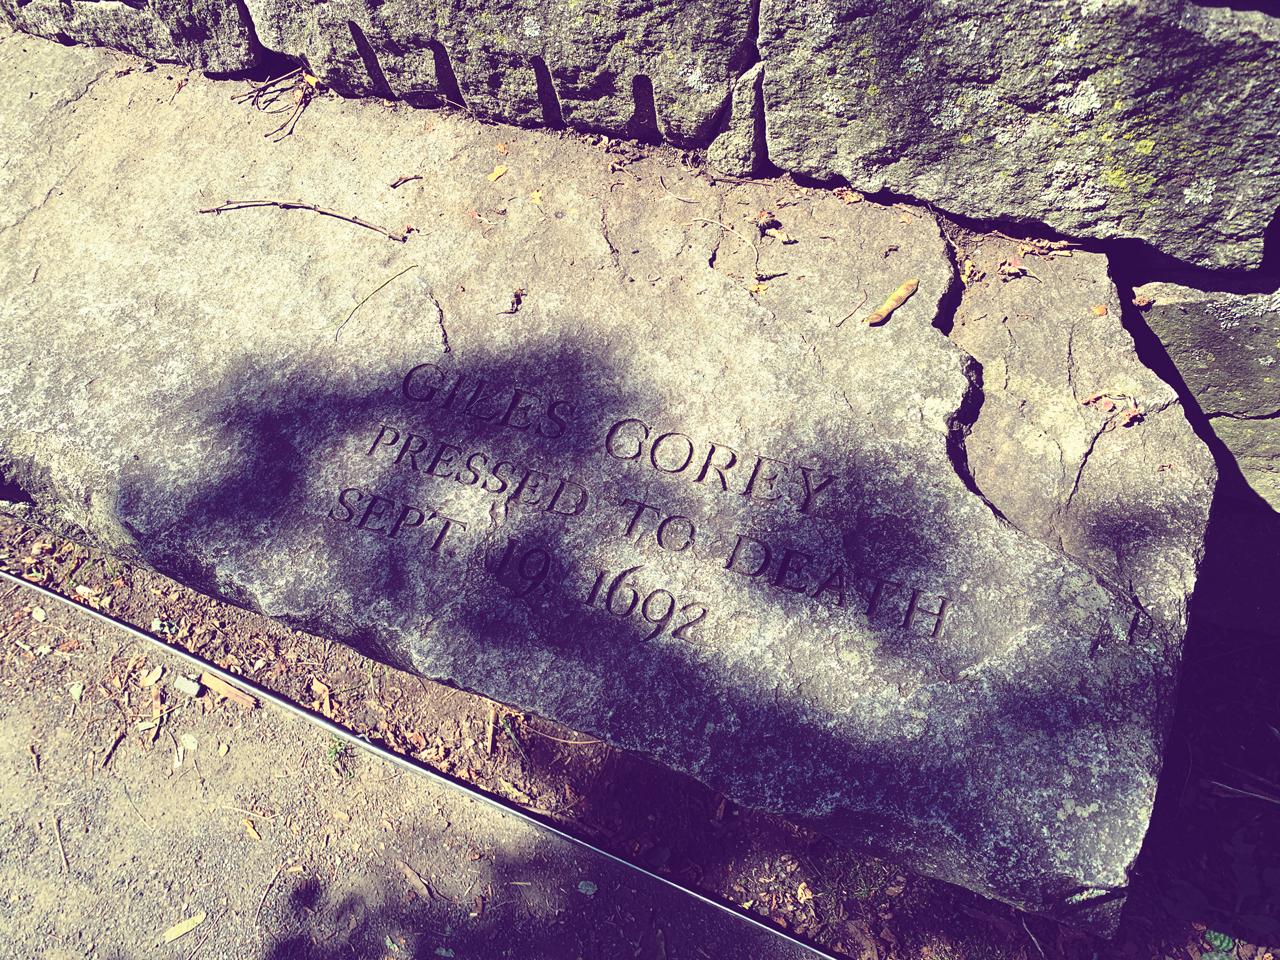 salem-witch-trials-memorial-massachusetts-giles-corey-1280x960